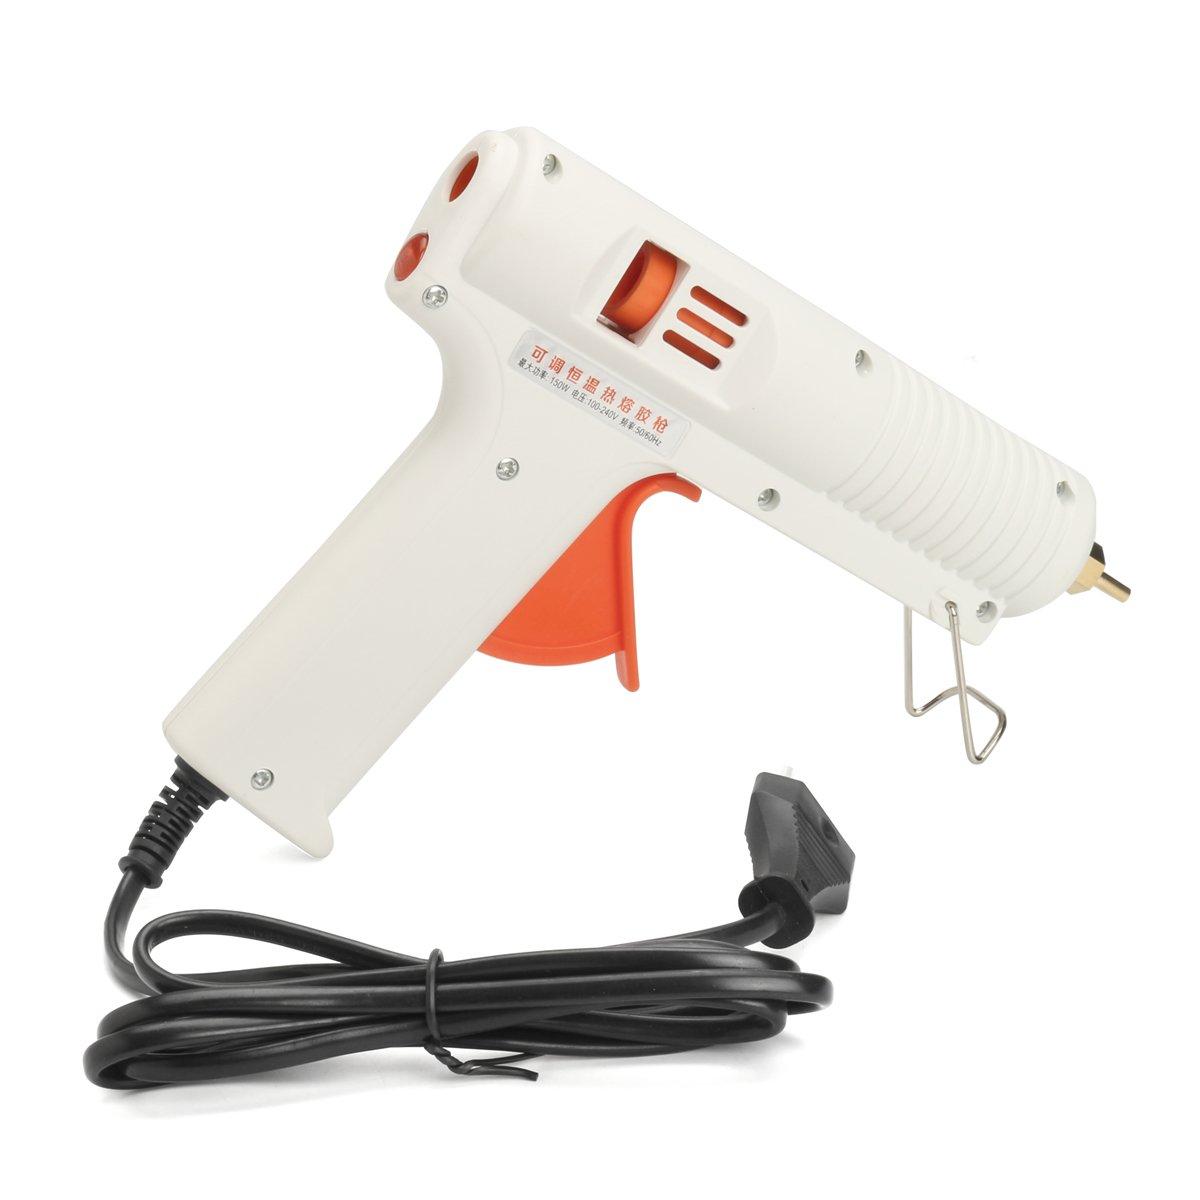 150W Hot Melt Glue Gun High Power Fast Heat Temperature 100-240V Adjustable EU Plug